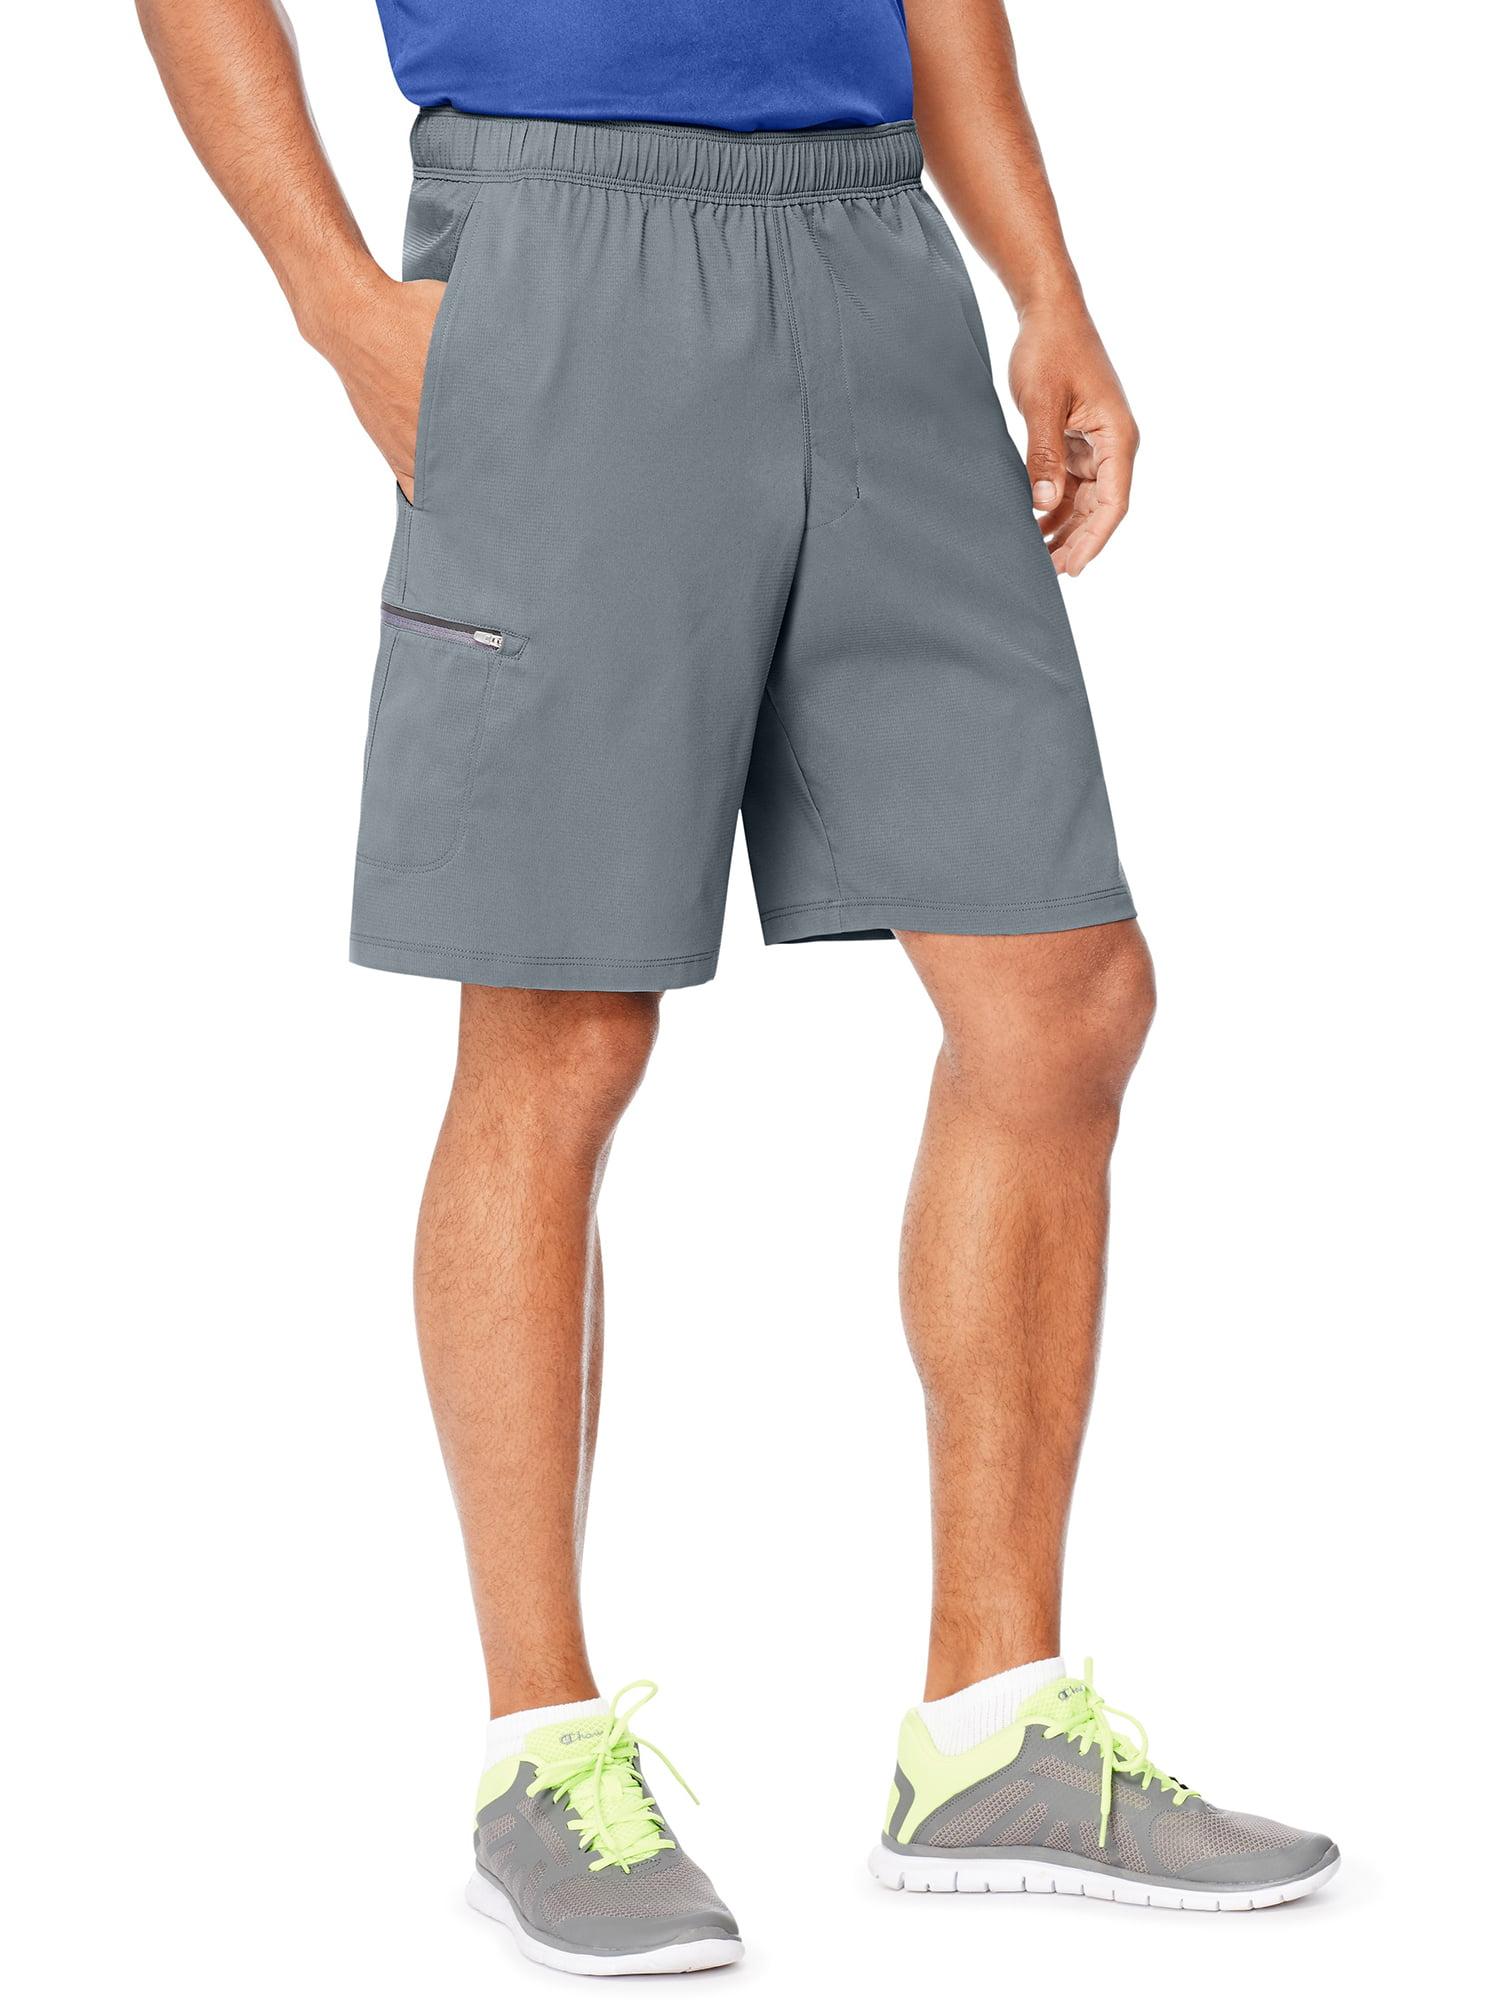 Sport Men's Hybrid Pocket Shorts, up to 2XL